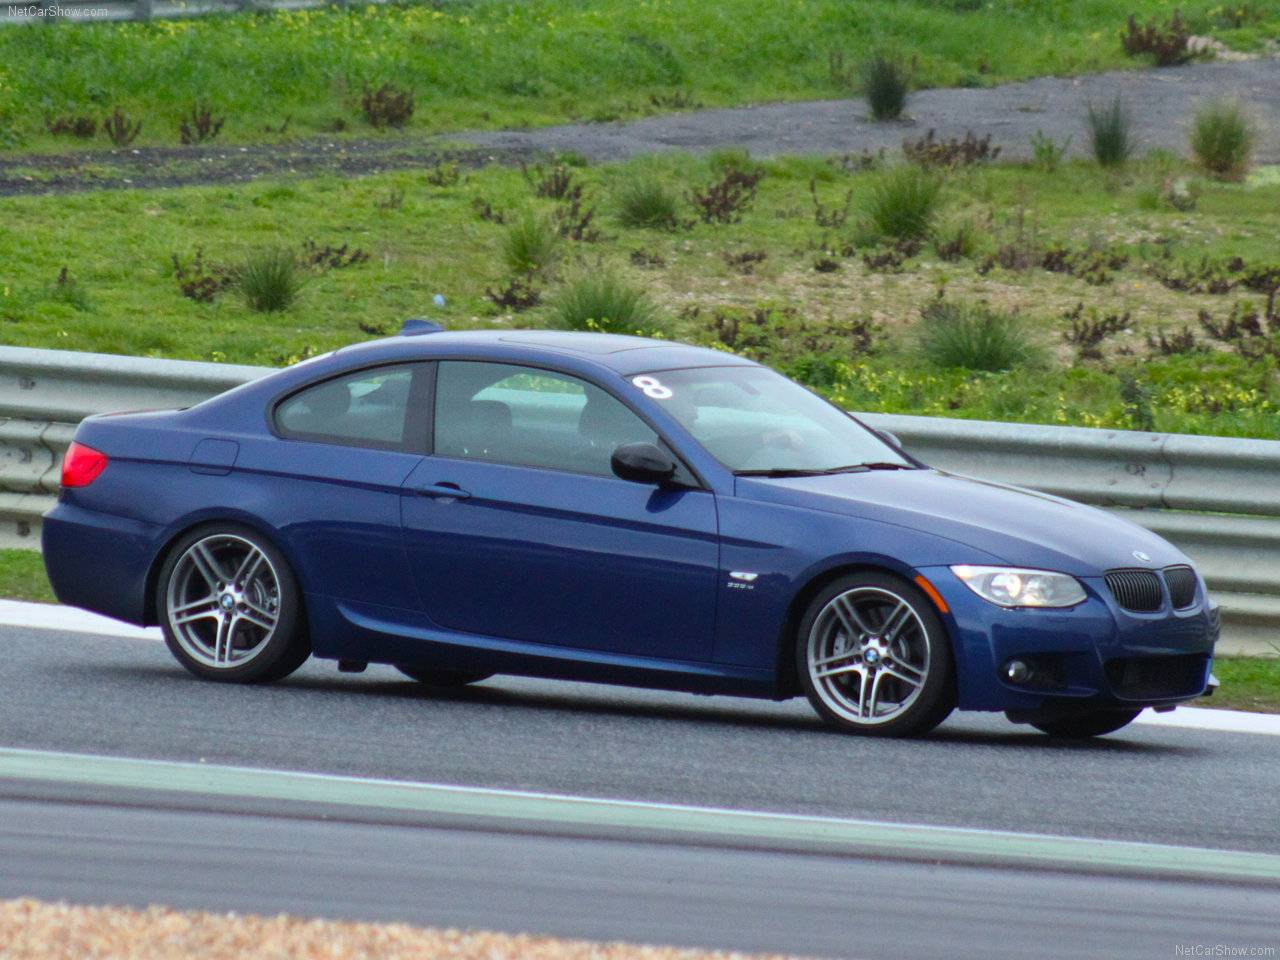 http://2.bp.blogspot.com/_lsyt_wQ2awY/TDQ96AcXpuI/AAAAAAAB7Ak/RvpK2x23w-w/s1600/BMW-335is_Coupe_2011_1280x960_wallpaper_08.jpg